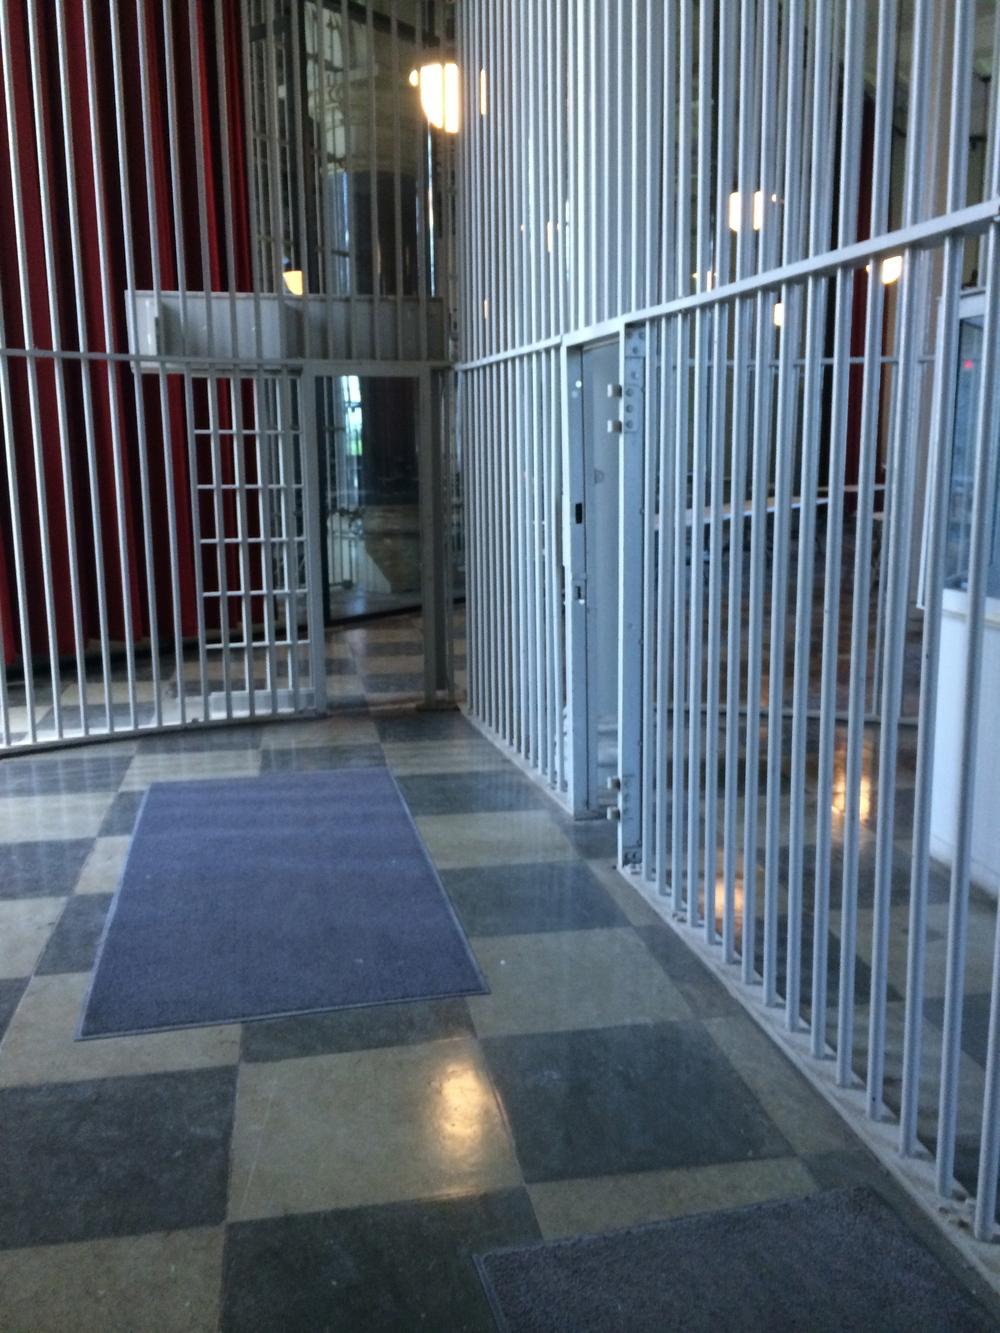 20 - prison cafeteria.jpg